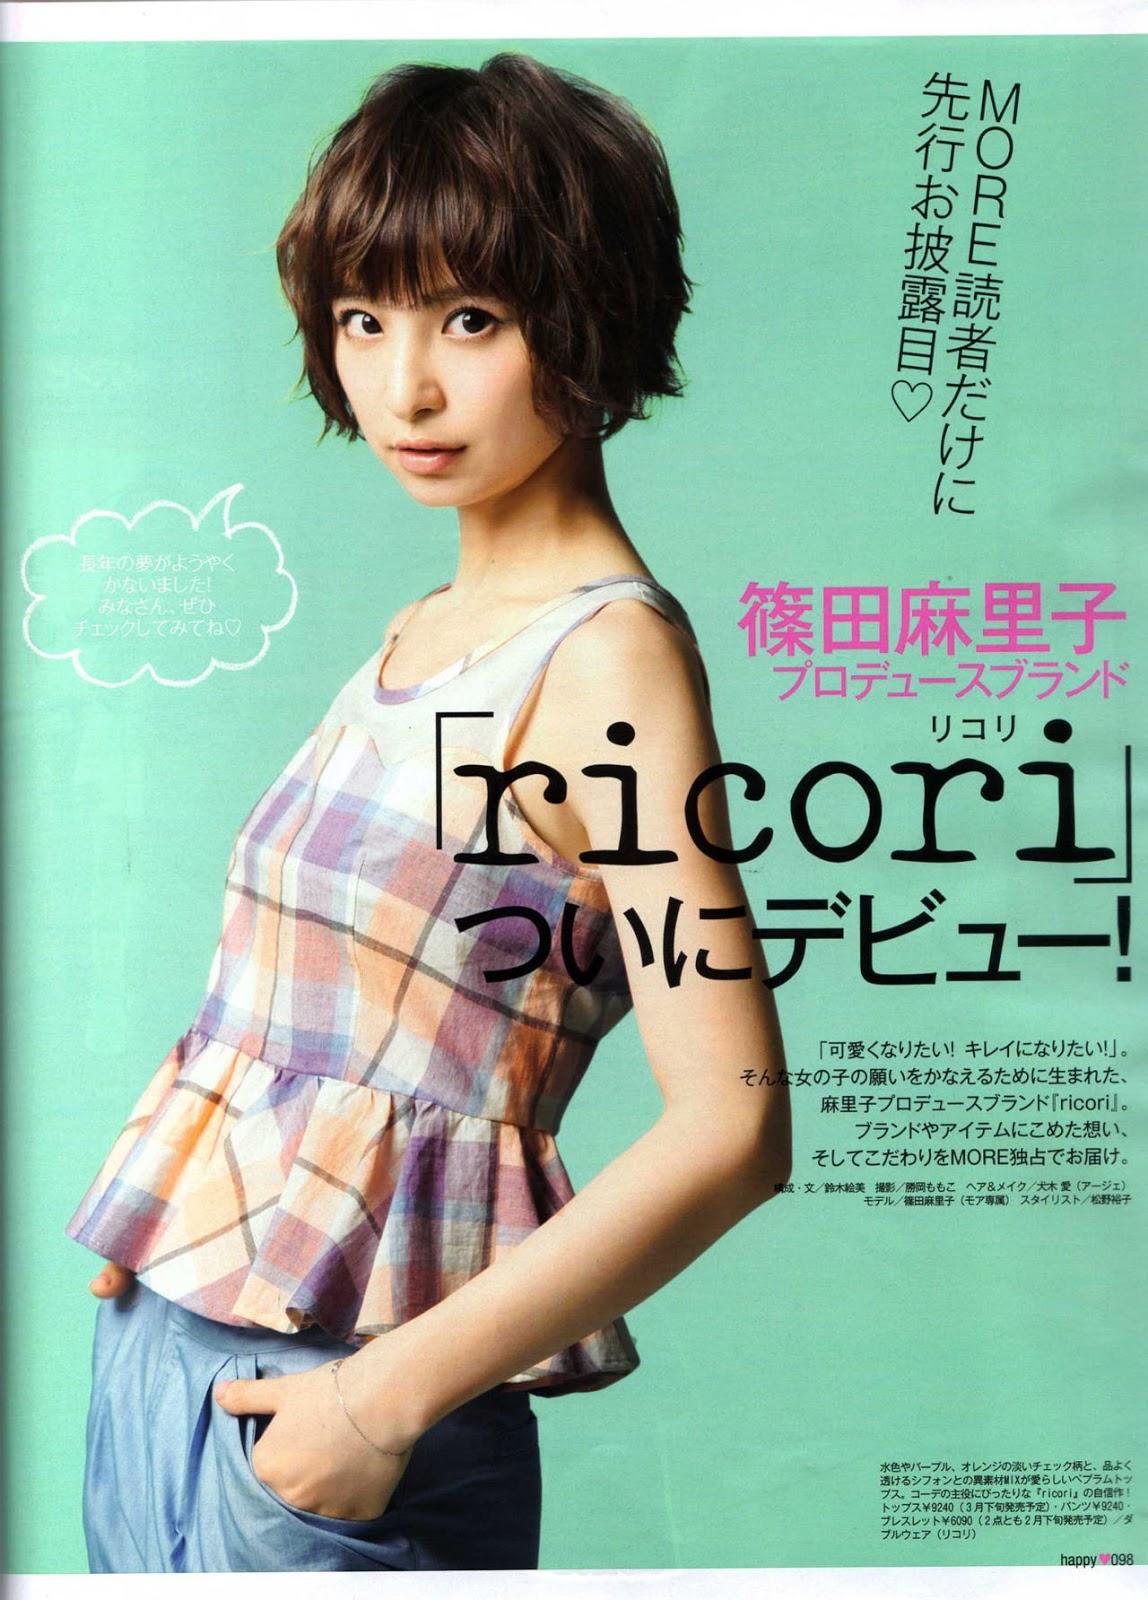 "AKB48 Mariko Shinoda ""ricori Debut"" On MORE Magazine"